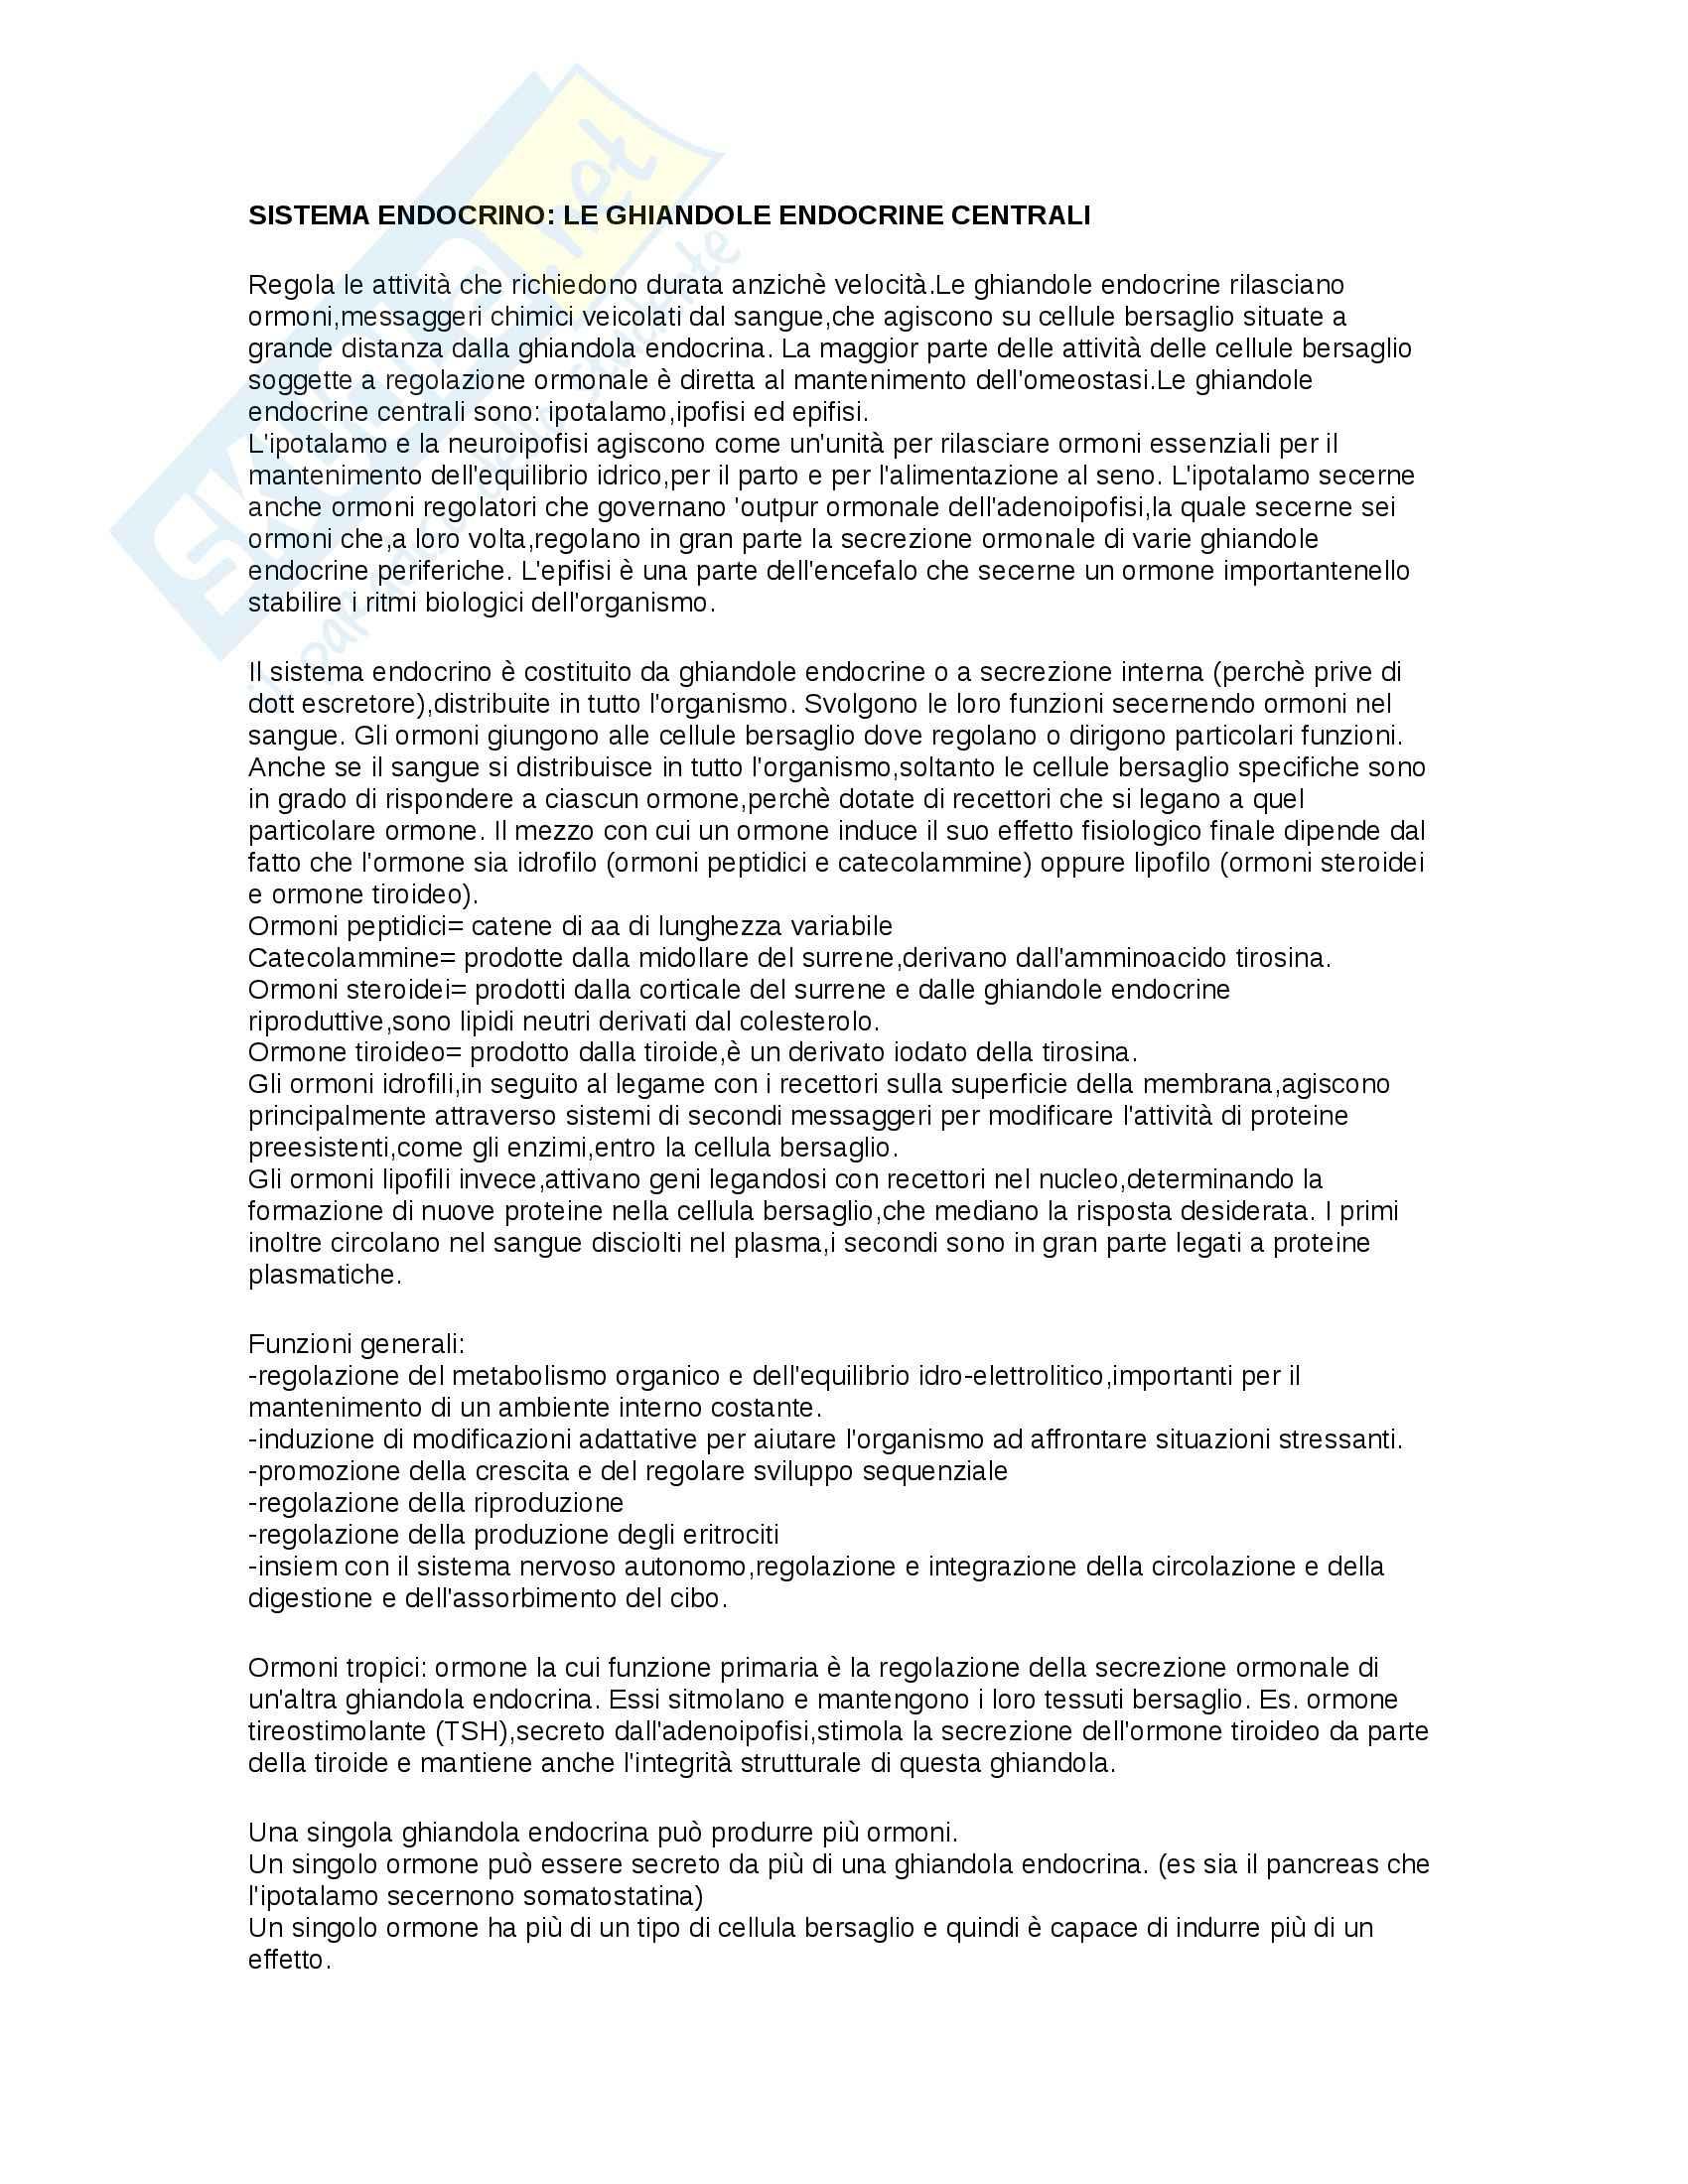 Sistema endocrino (basi), Fisiologia degli apparati